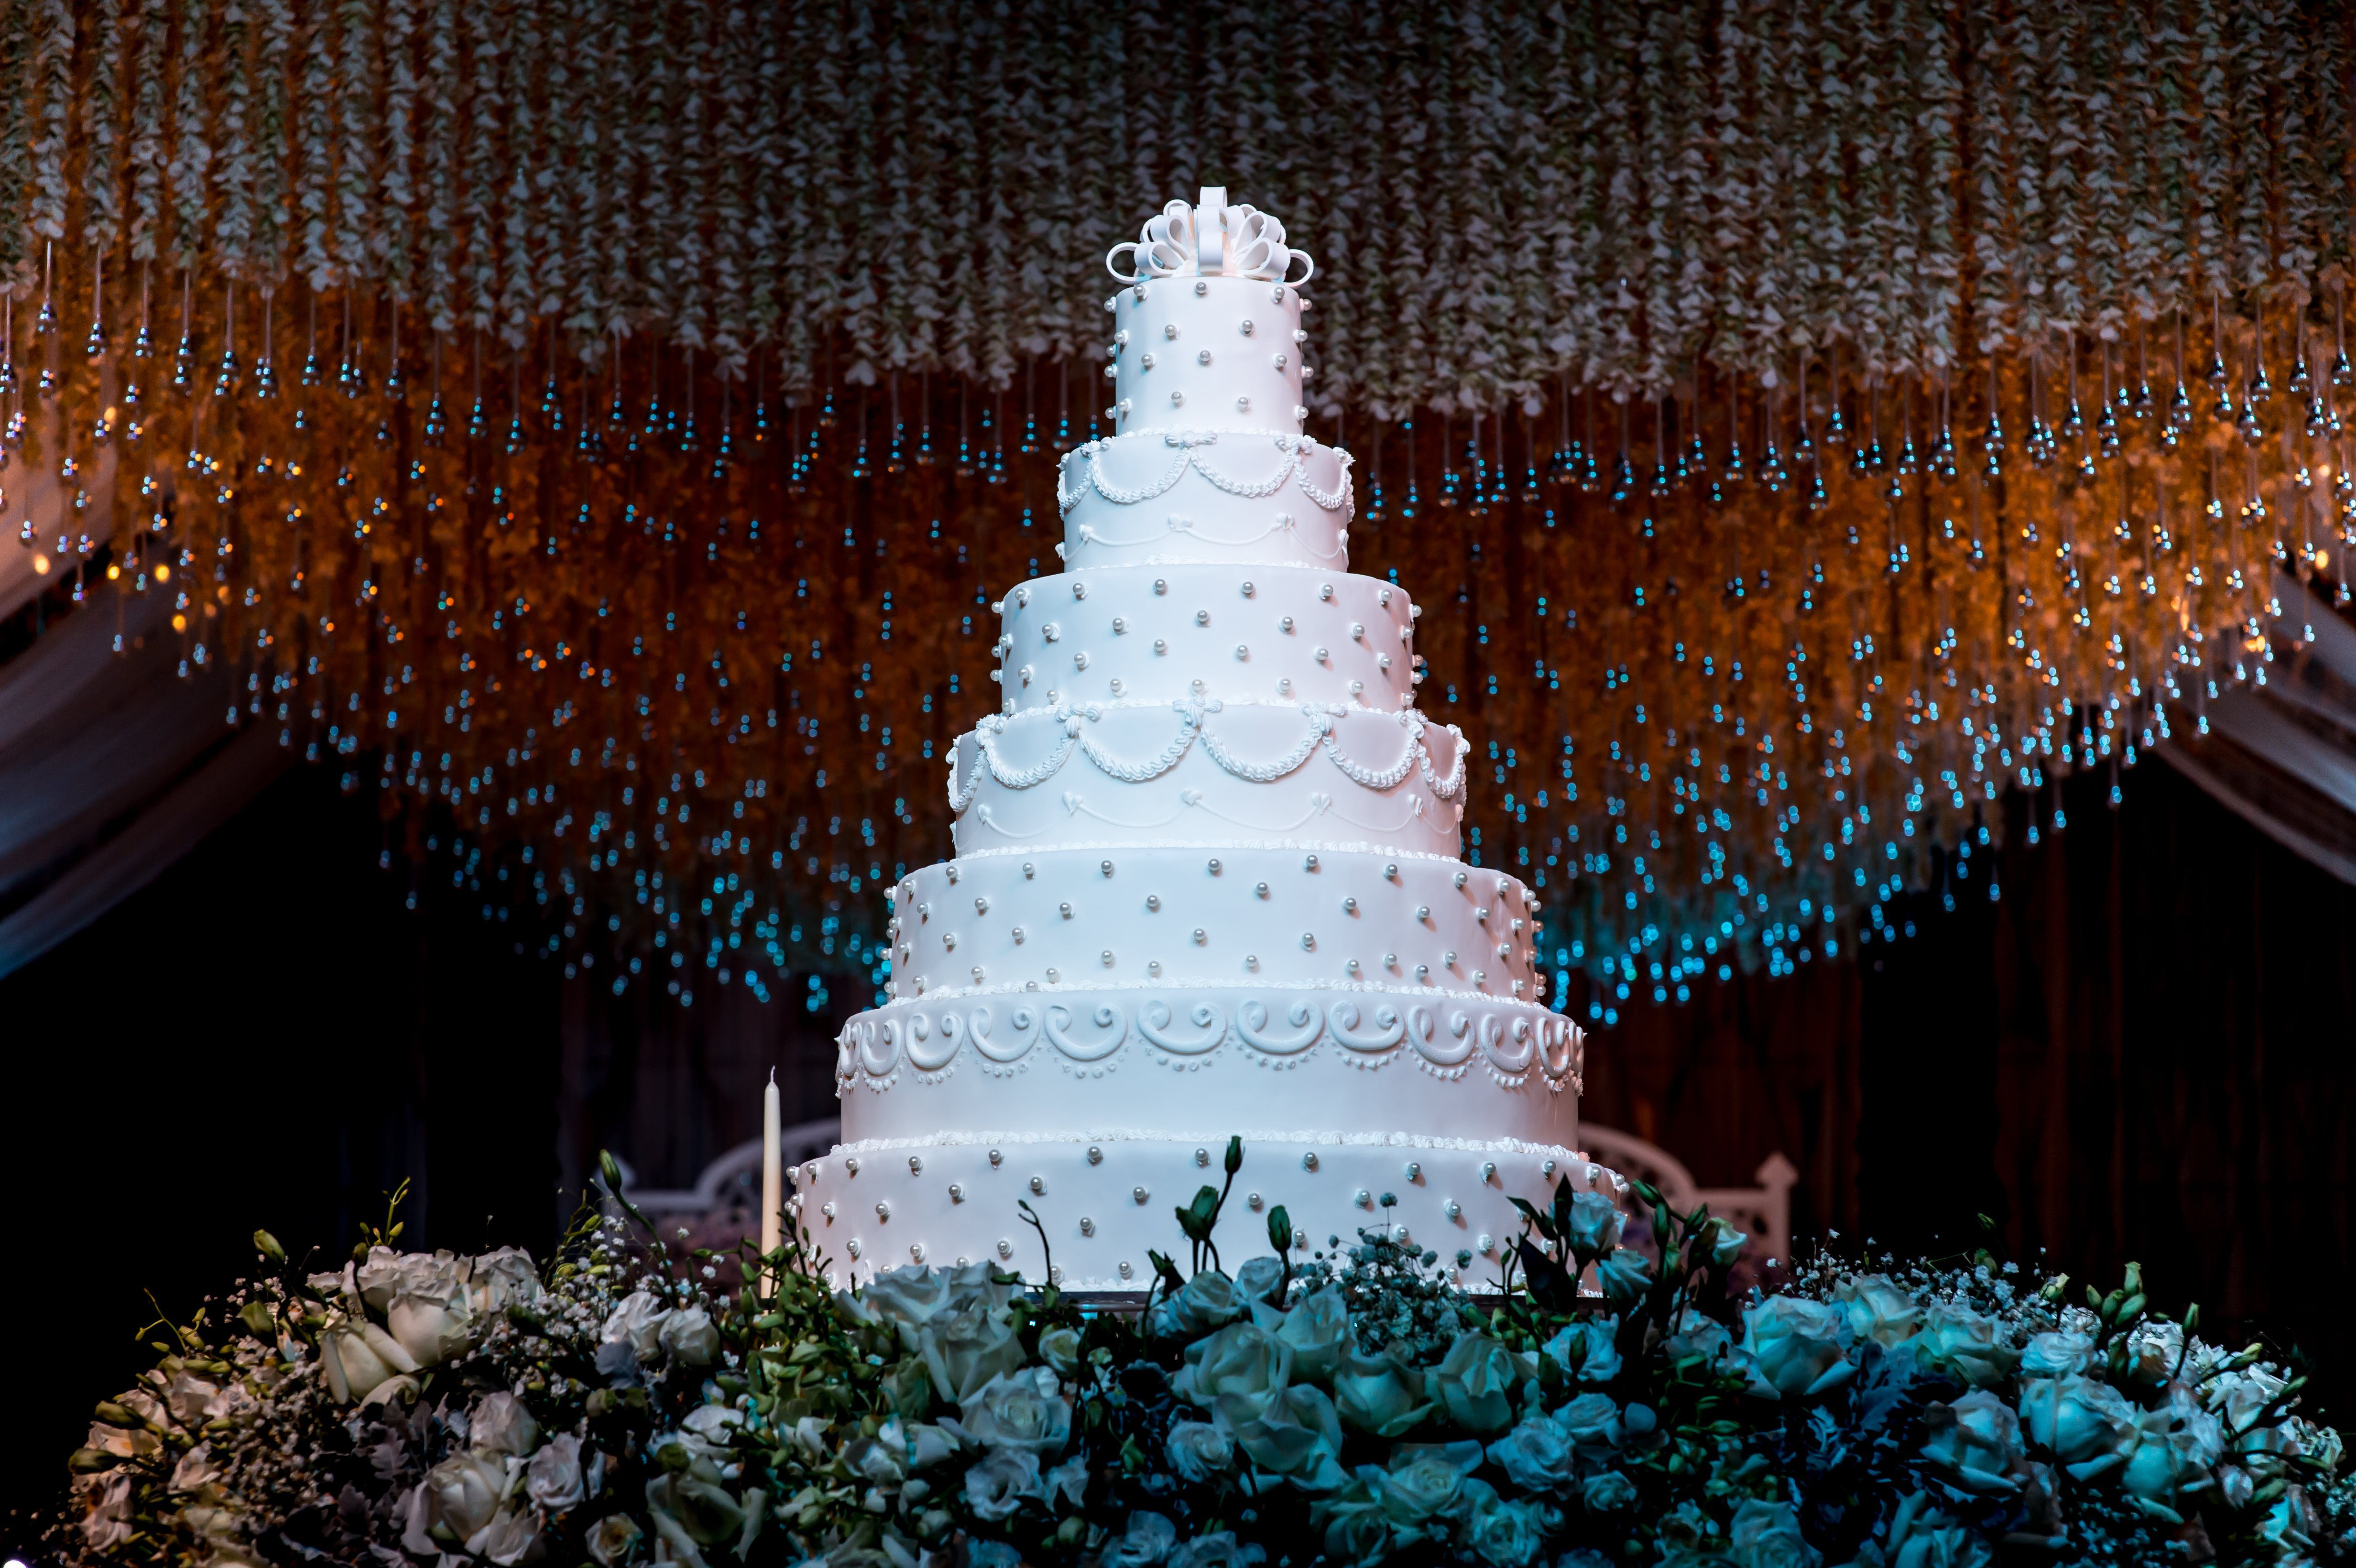 Home Sugar Arts Institute Cake Decorating Classes Receptions